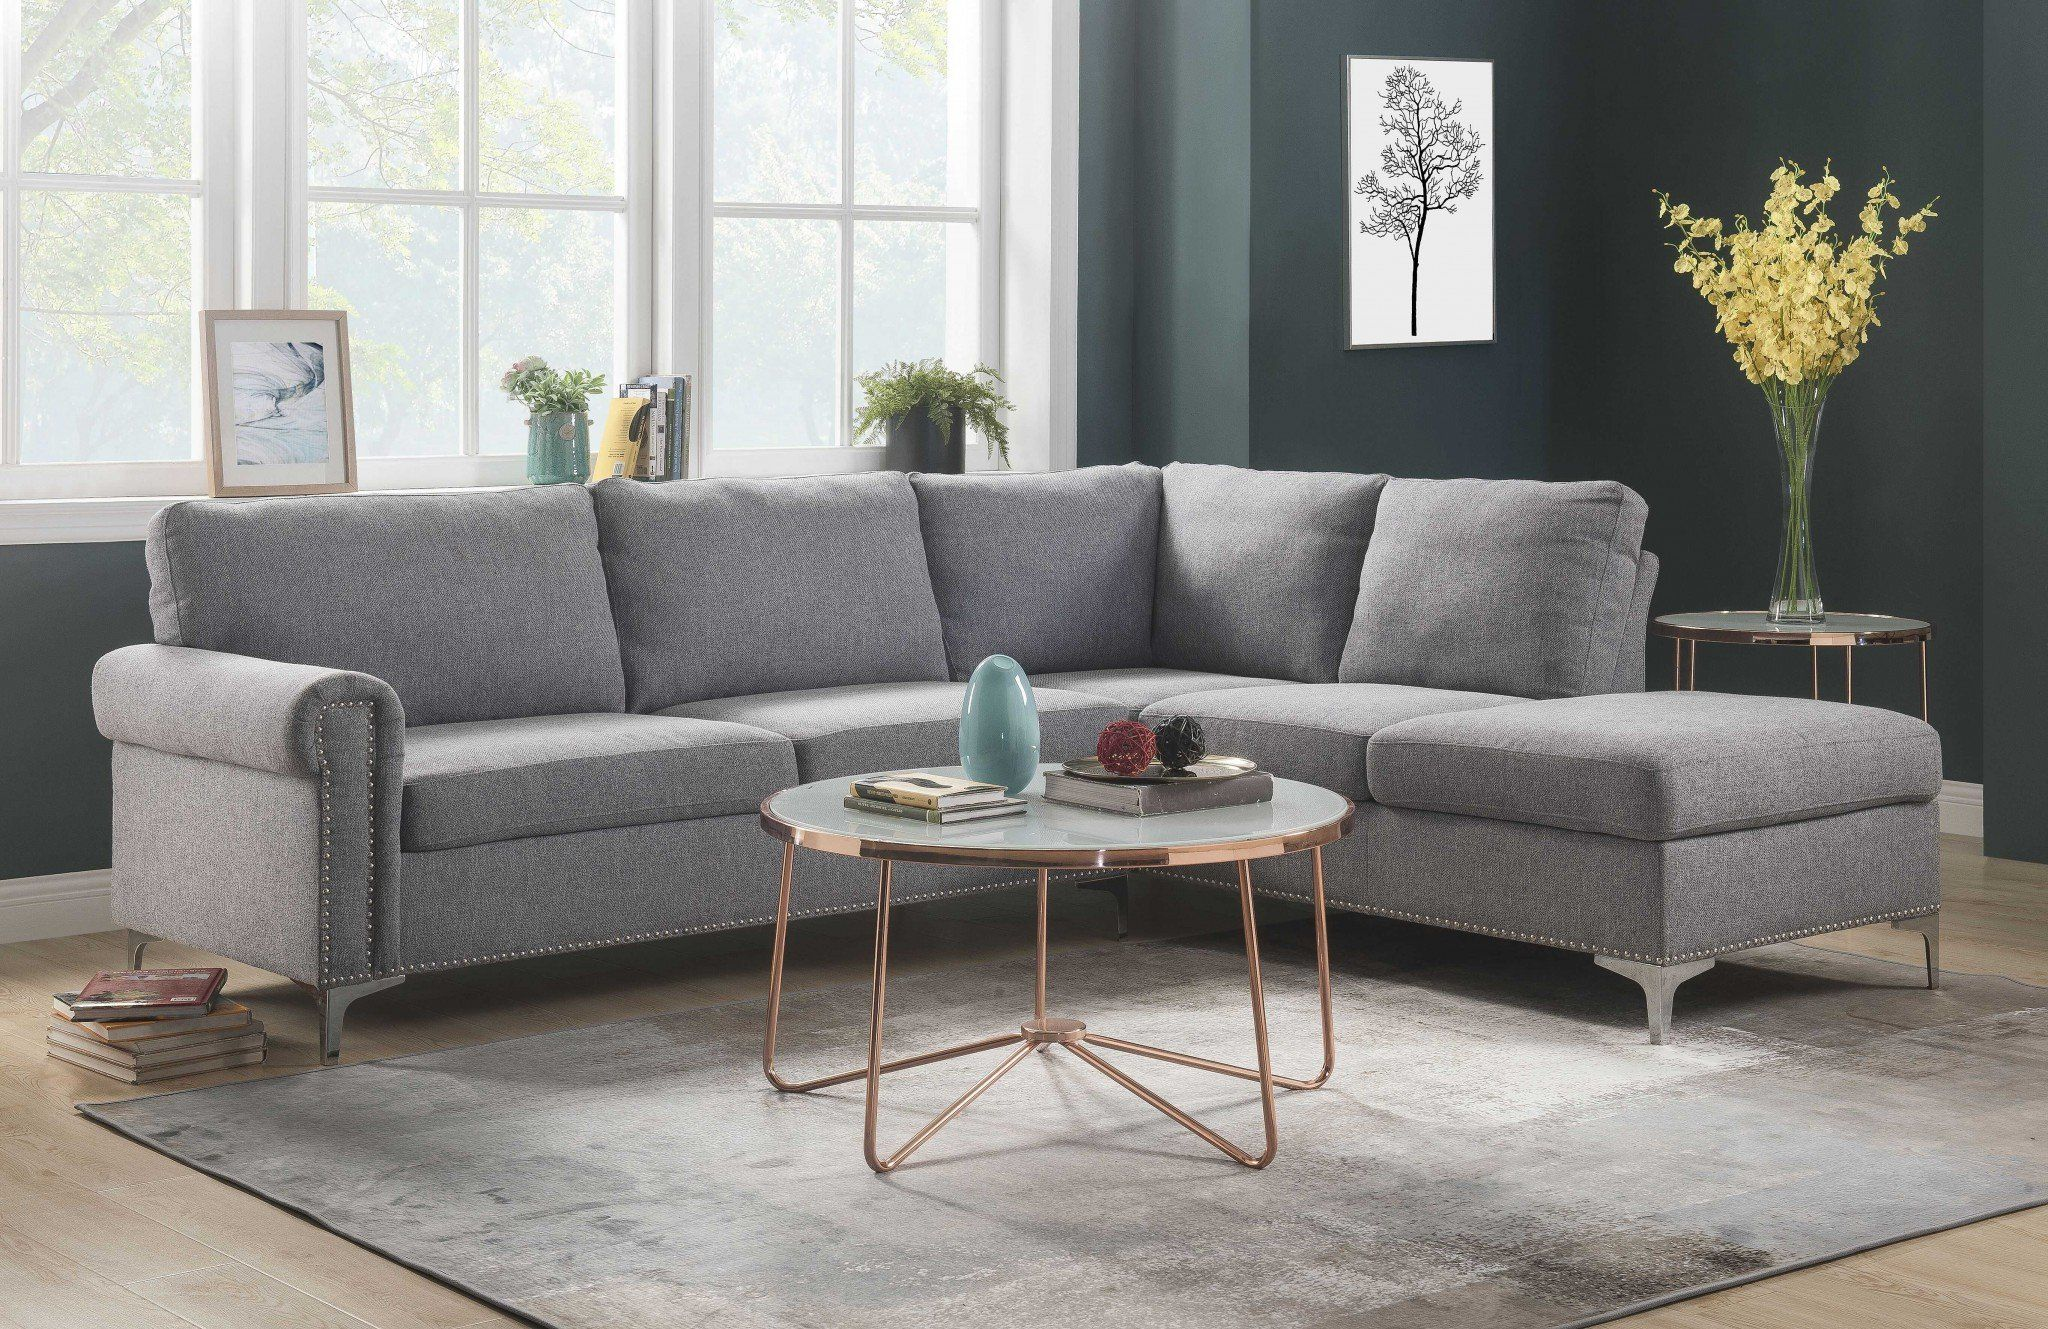 Photo of 78″ X 100″ X 35″ Gray Fabric Upholstery Metal Leg Sectional Sofa